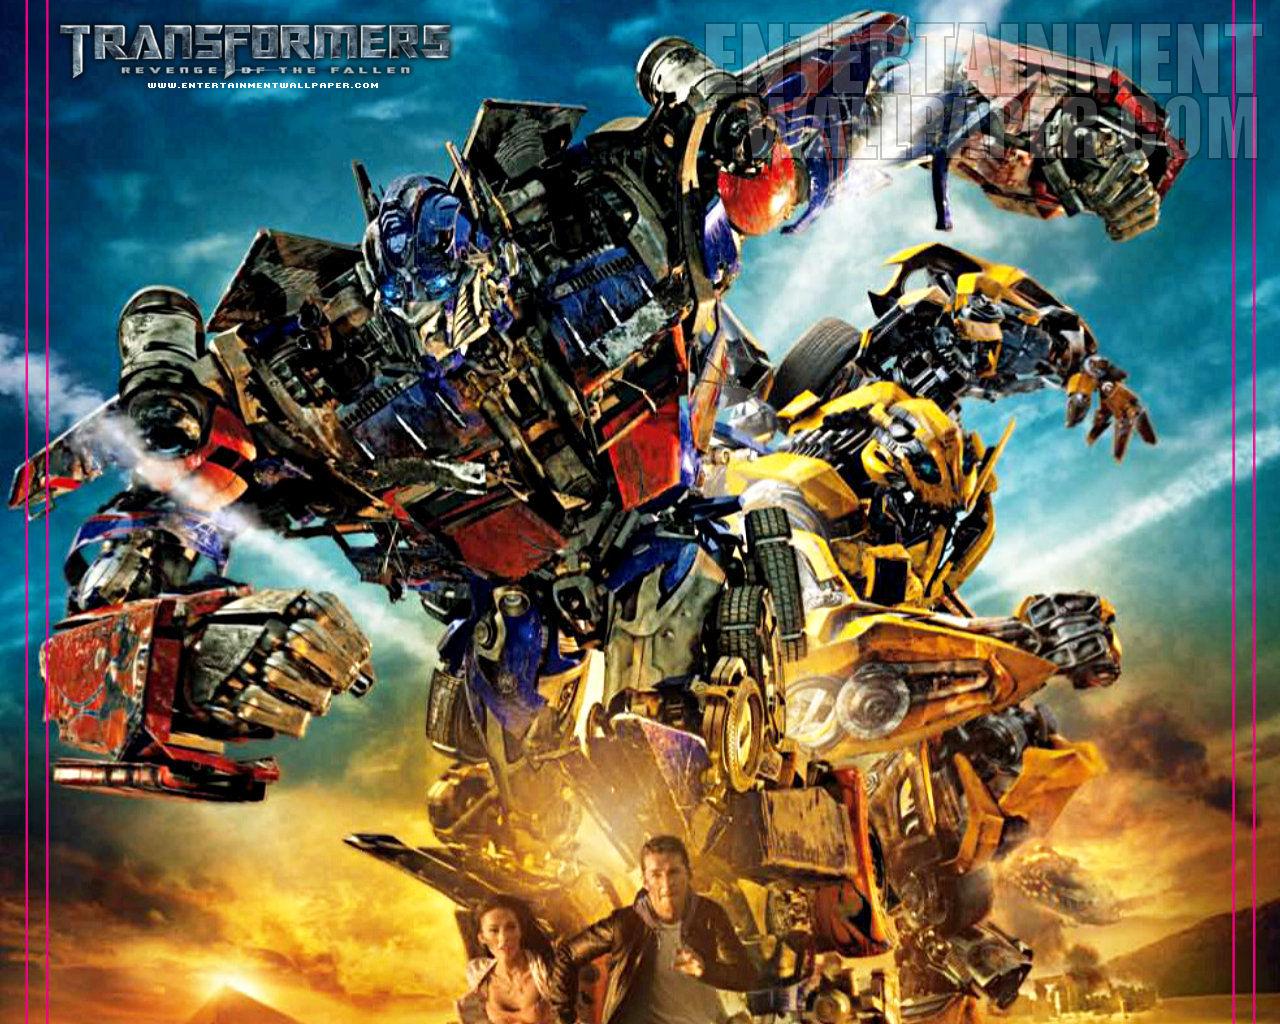 wallpohcom Download Transformers Wallpapers Wallpoh 1280x1024